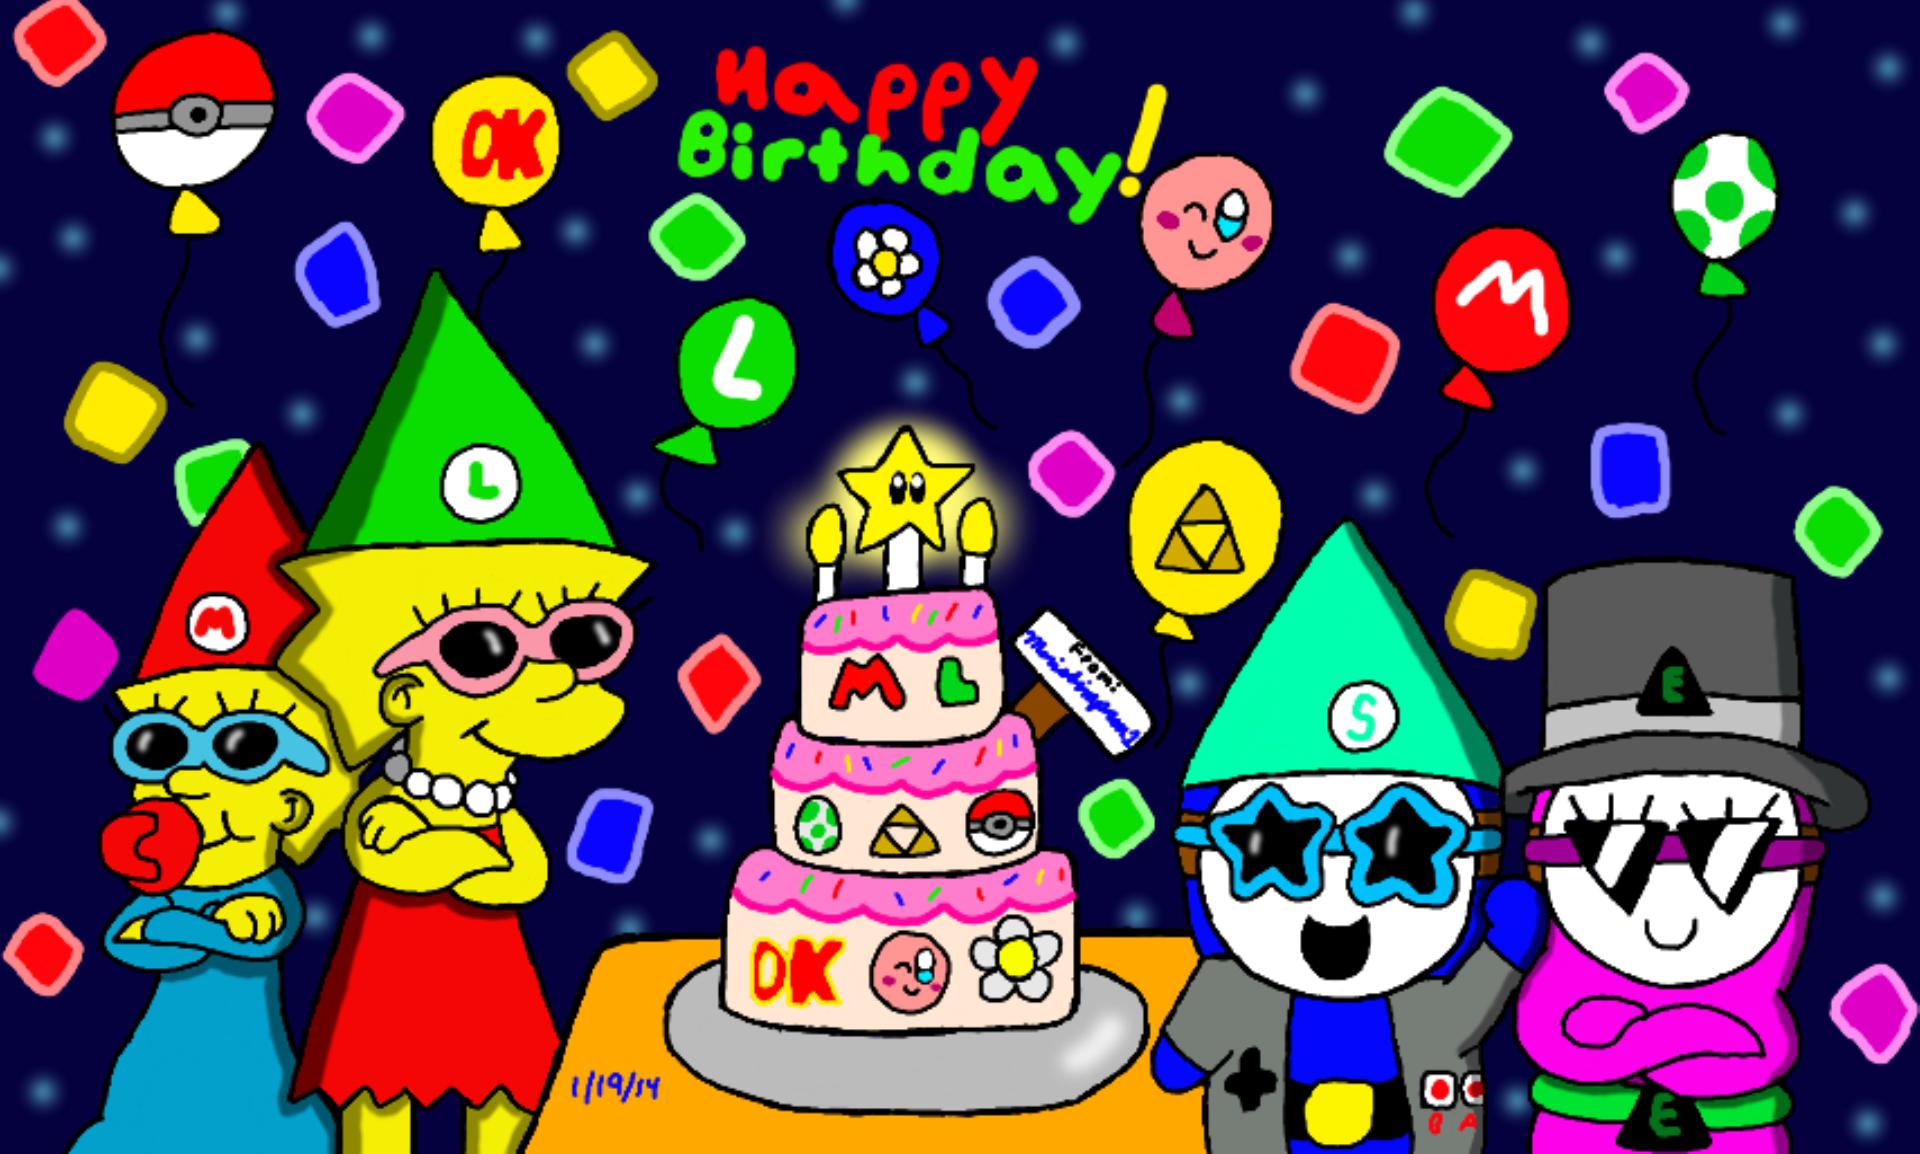 Happy Birthday Cake Mario